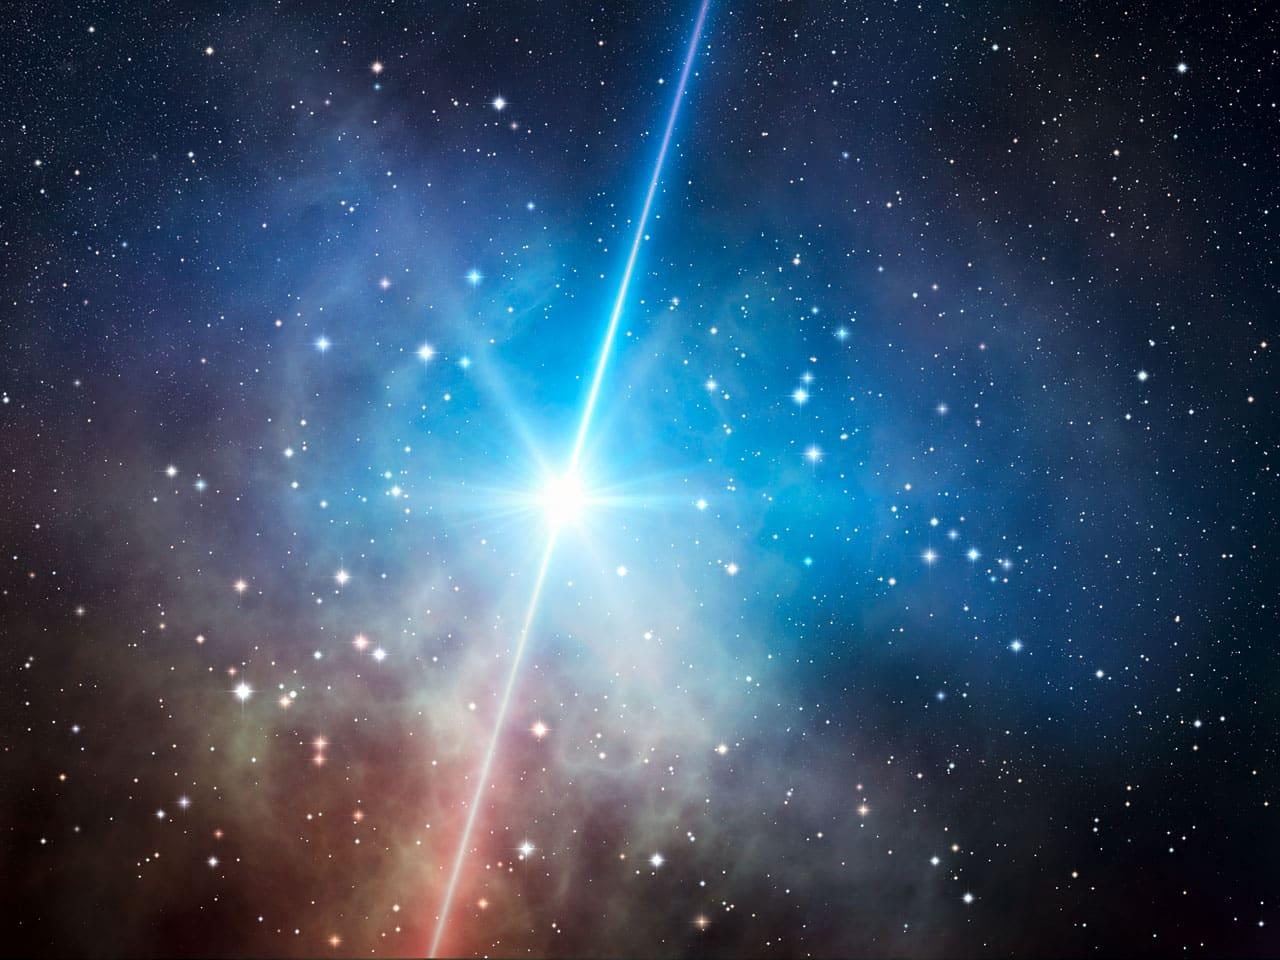 starry supernova - photo #21